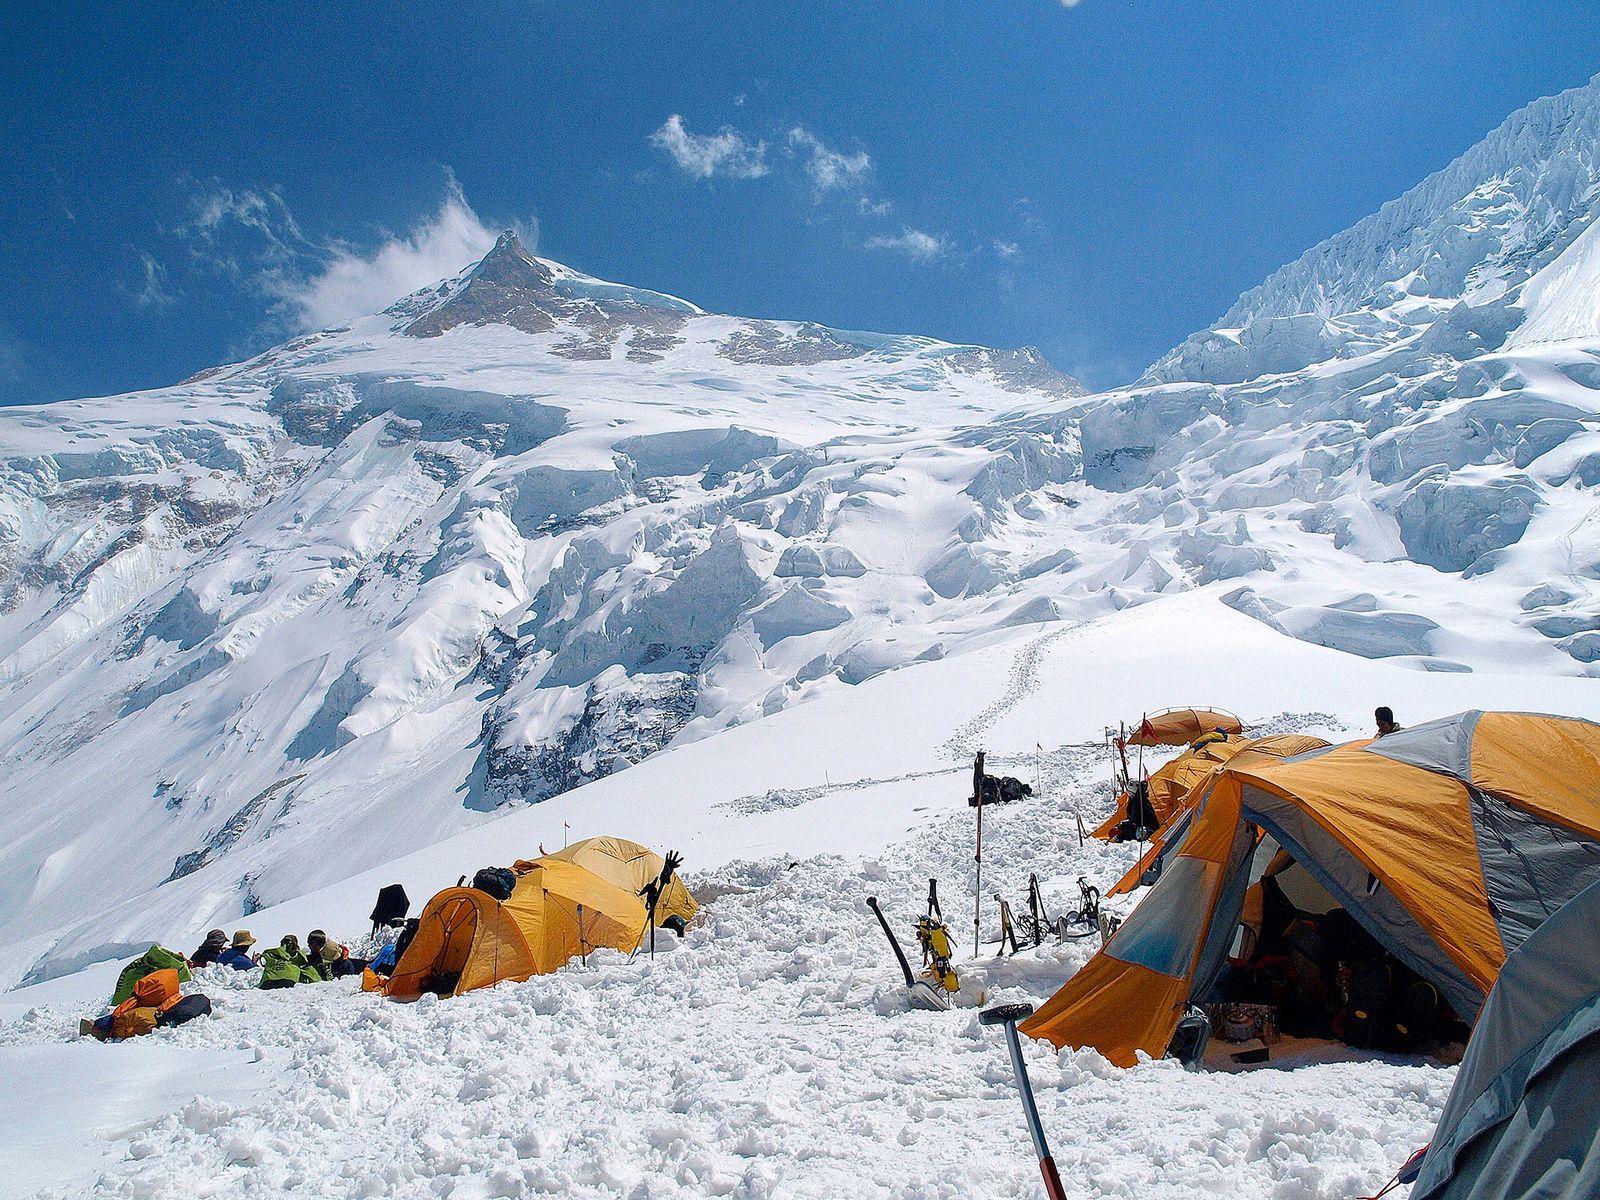 Sob a liderança de Lech Korniszewski, dois alpinistas de Zakopane, Polônia, Maciej Berbeka e Ryszard Gajewski, ...